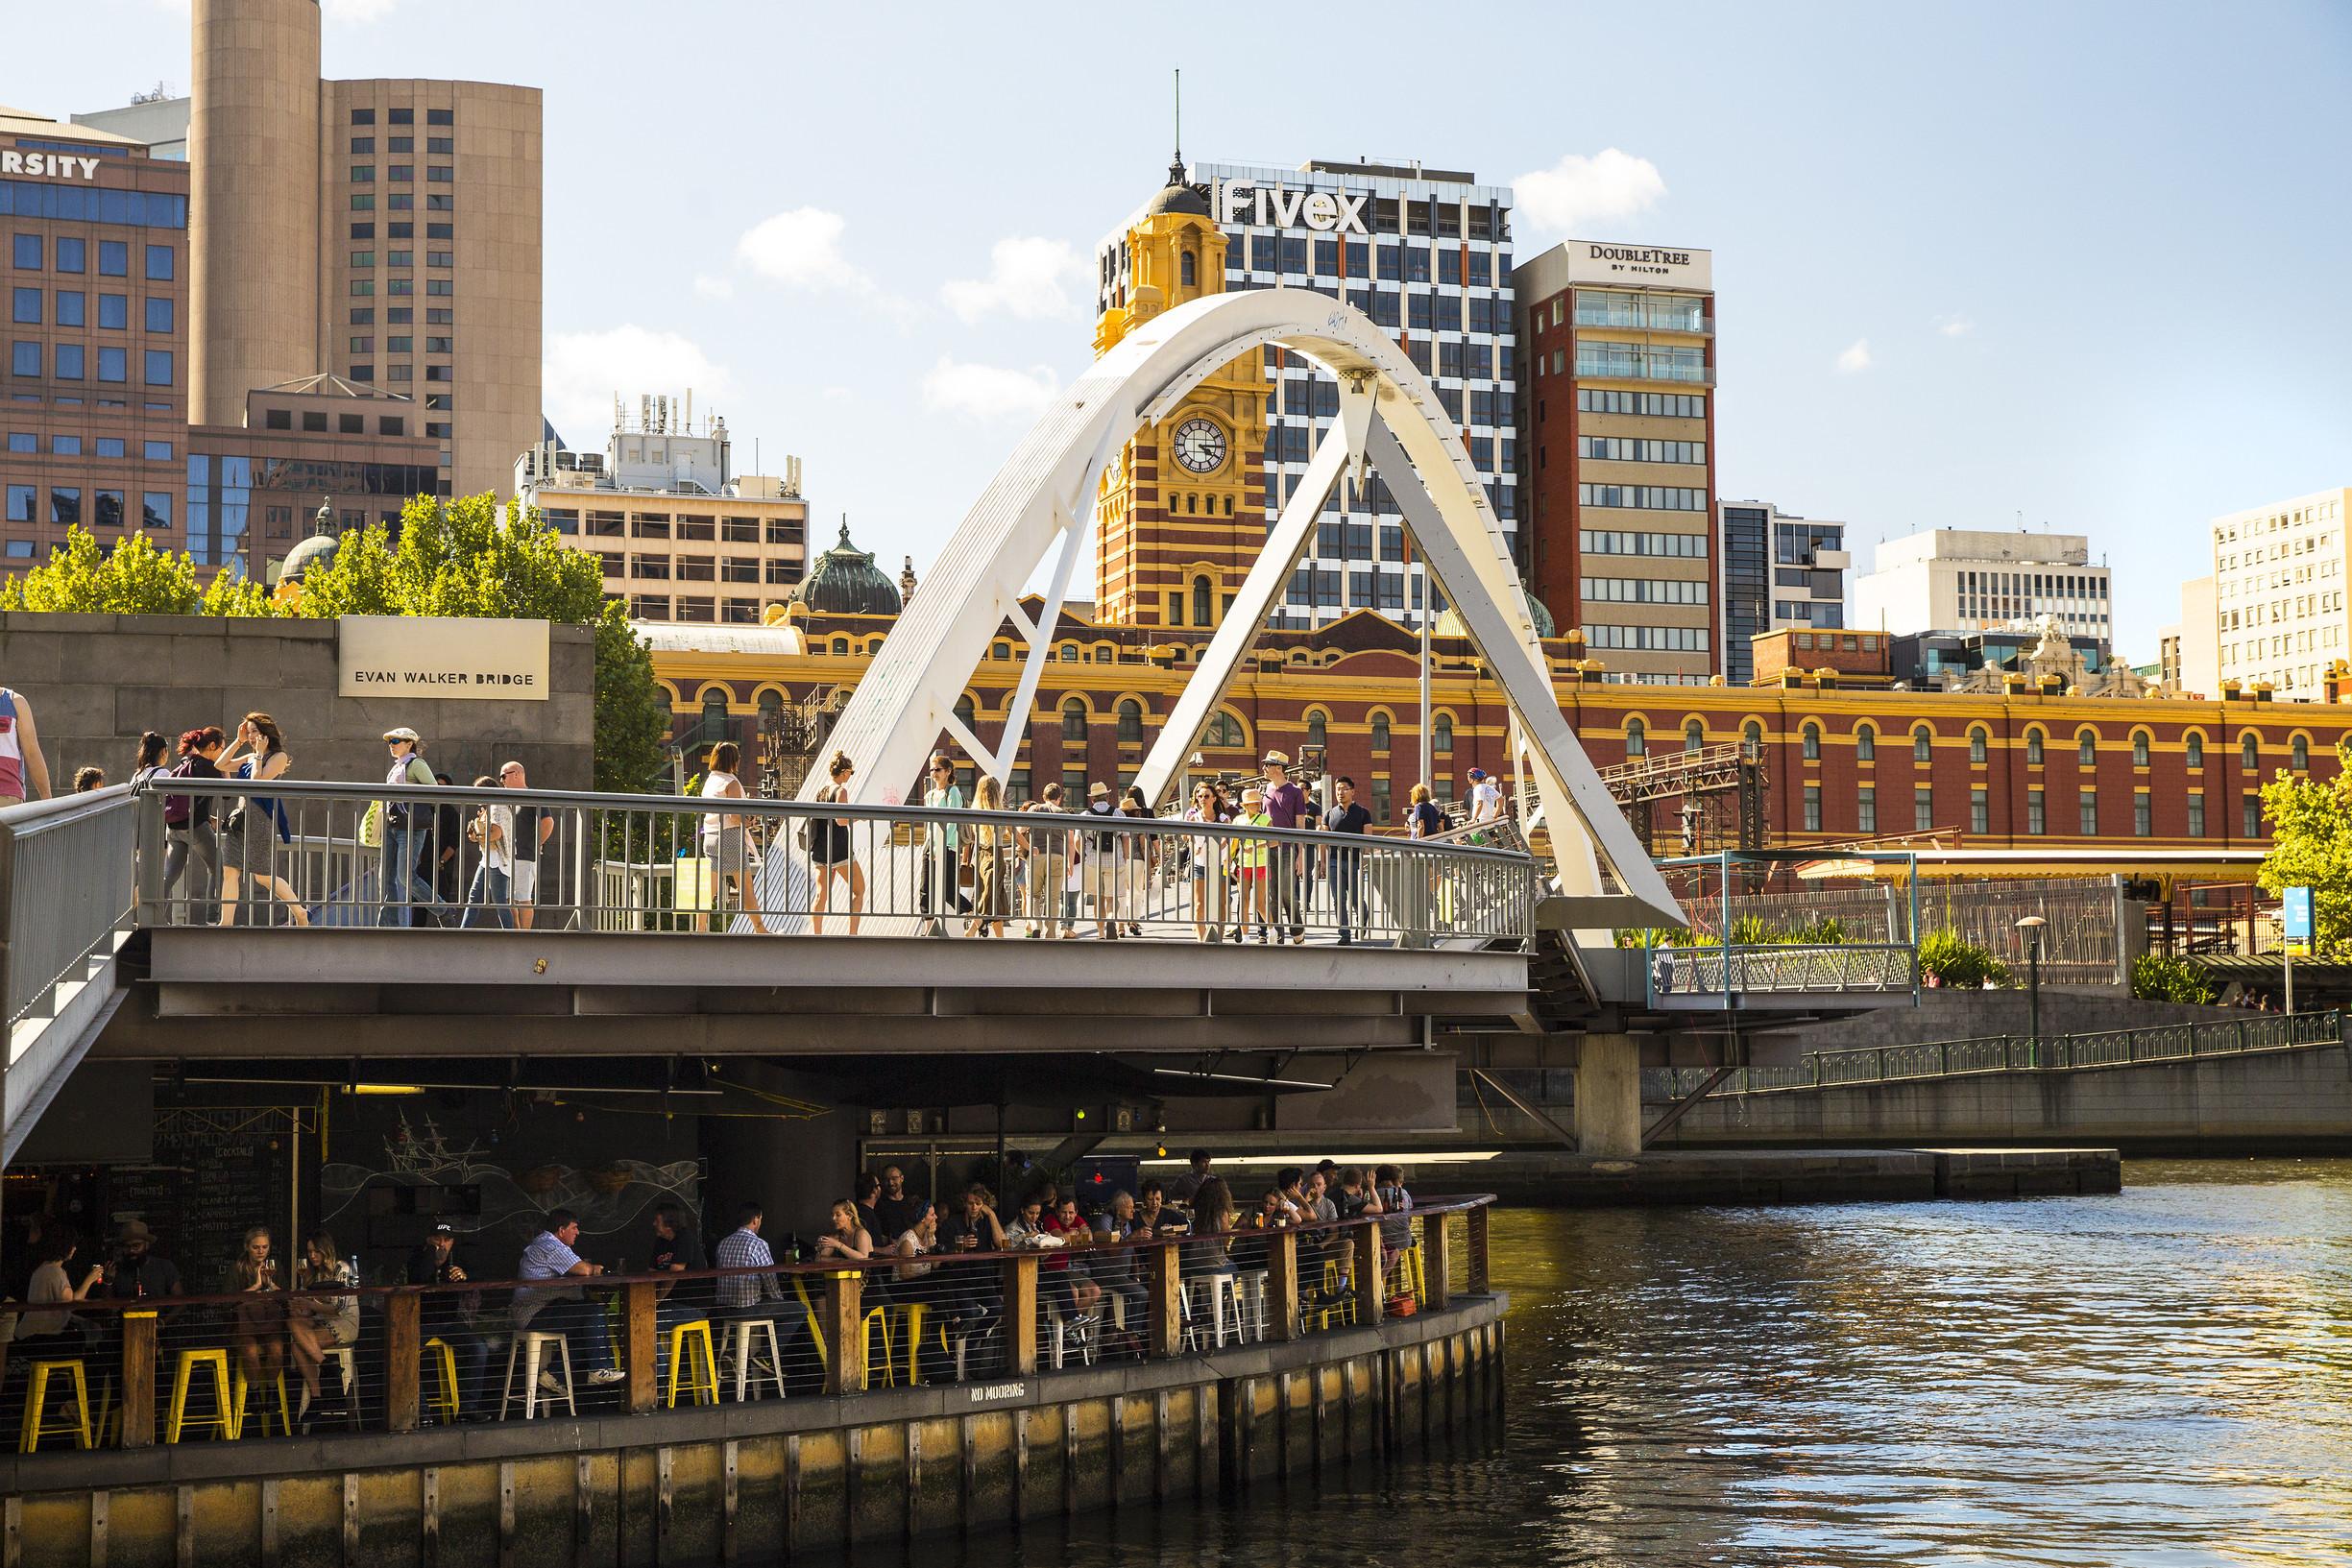 Evans Walker Bridge. Southbank, Melbourne